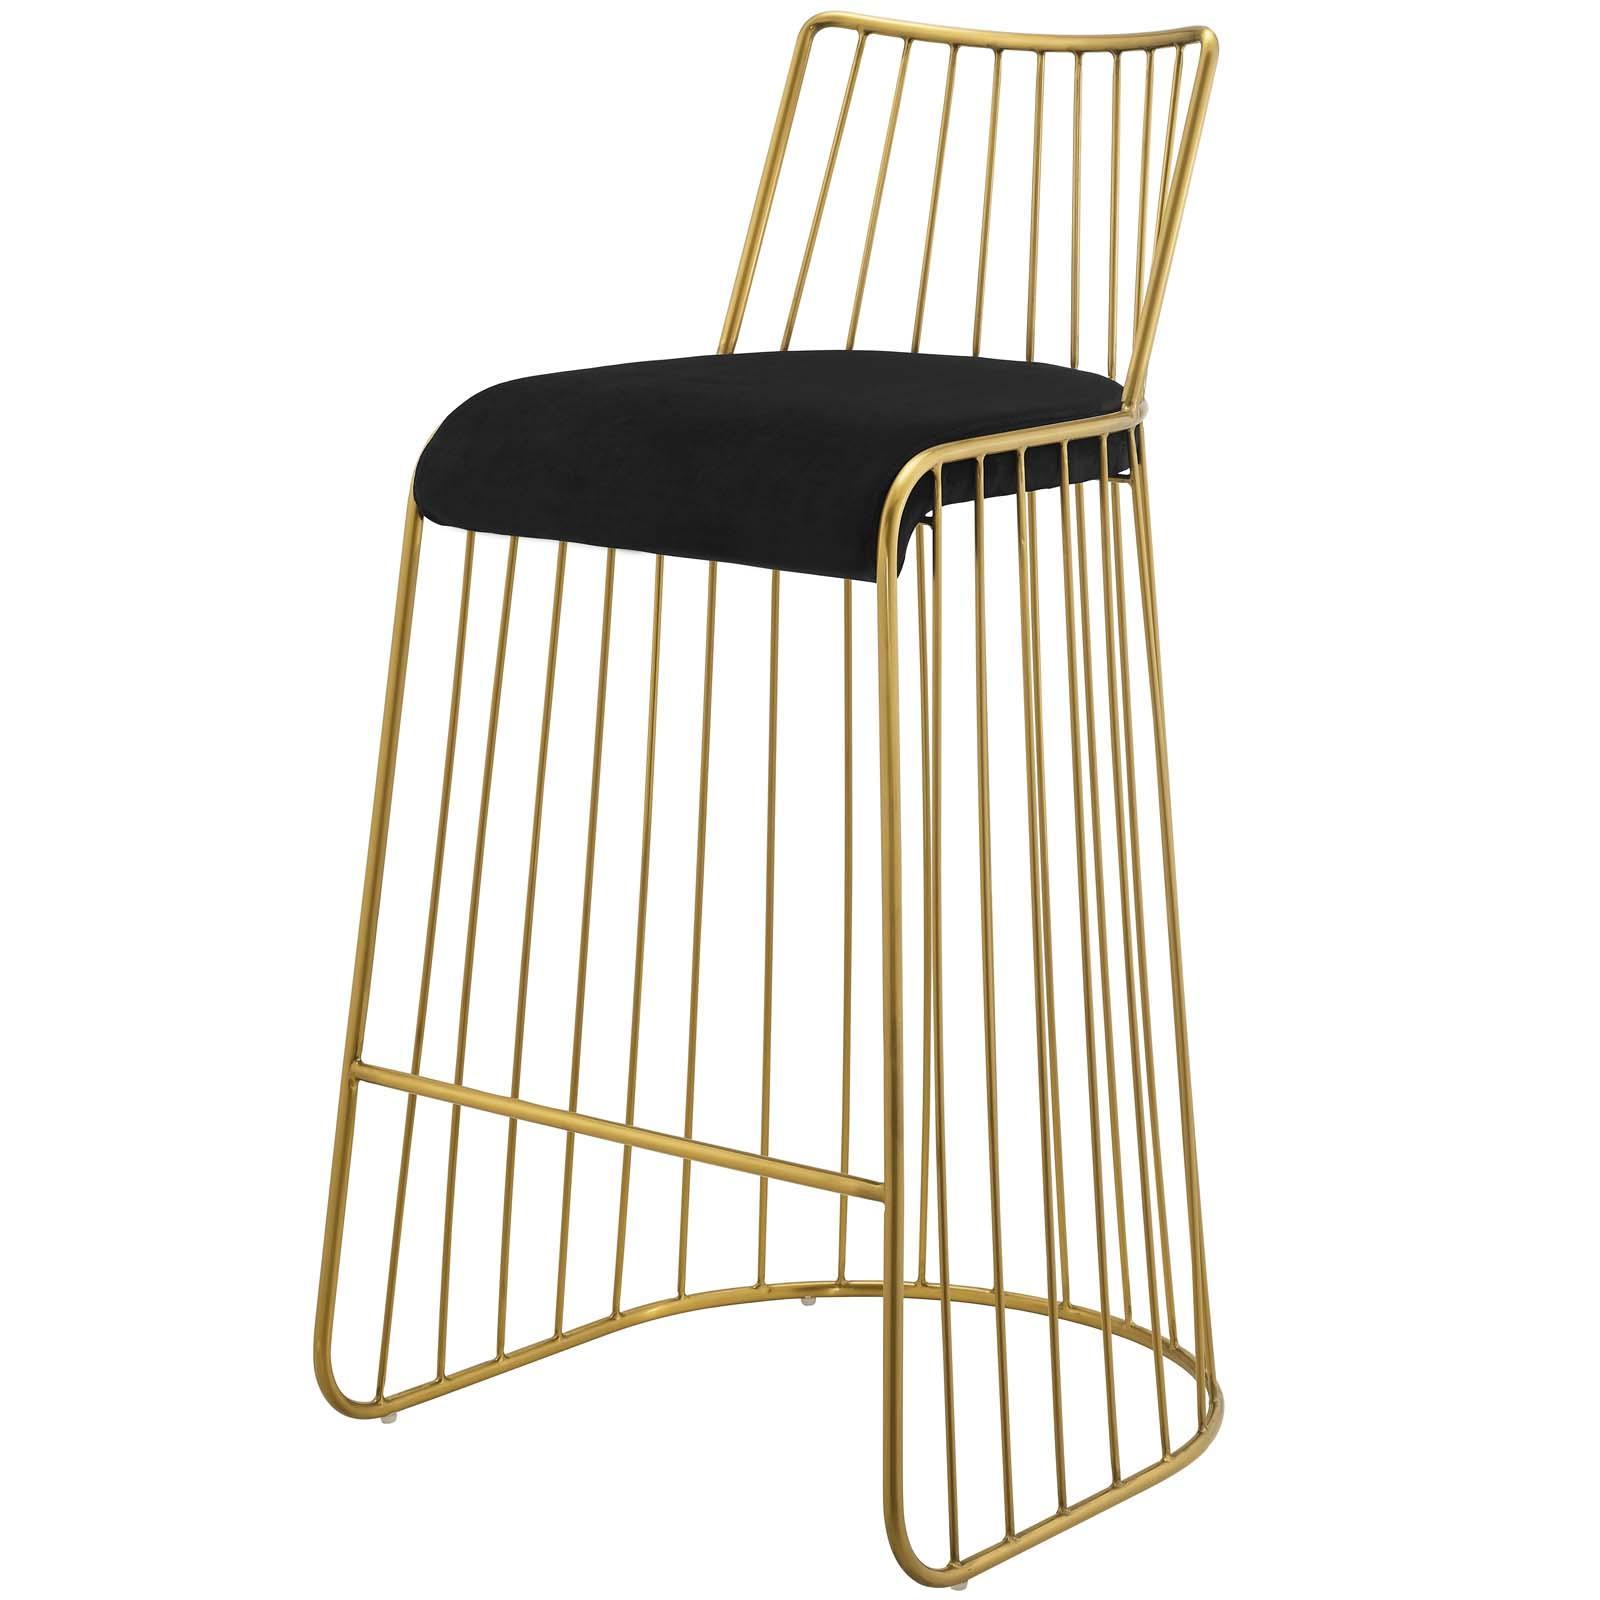 Pleasing Details About Modern Deco Lounge Stainless Pub Bar Stool Chair Velvet Gold Black 15382 Unemploymentrelief Wooden Chair Designs For Living Room Unemploymentrelieforg